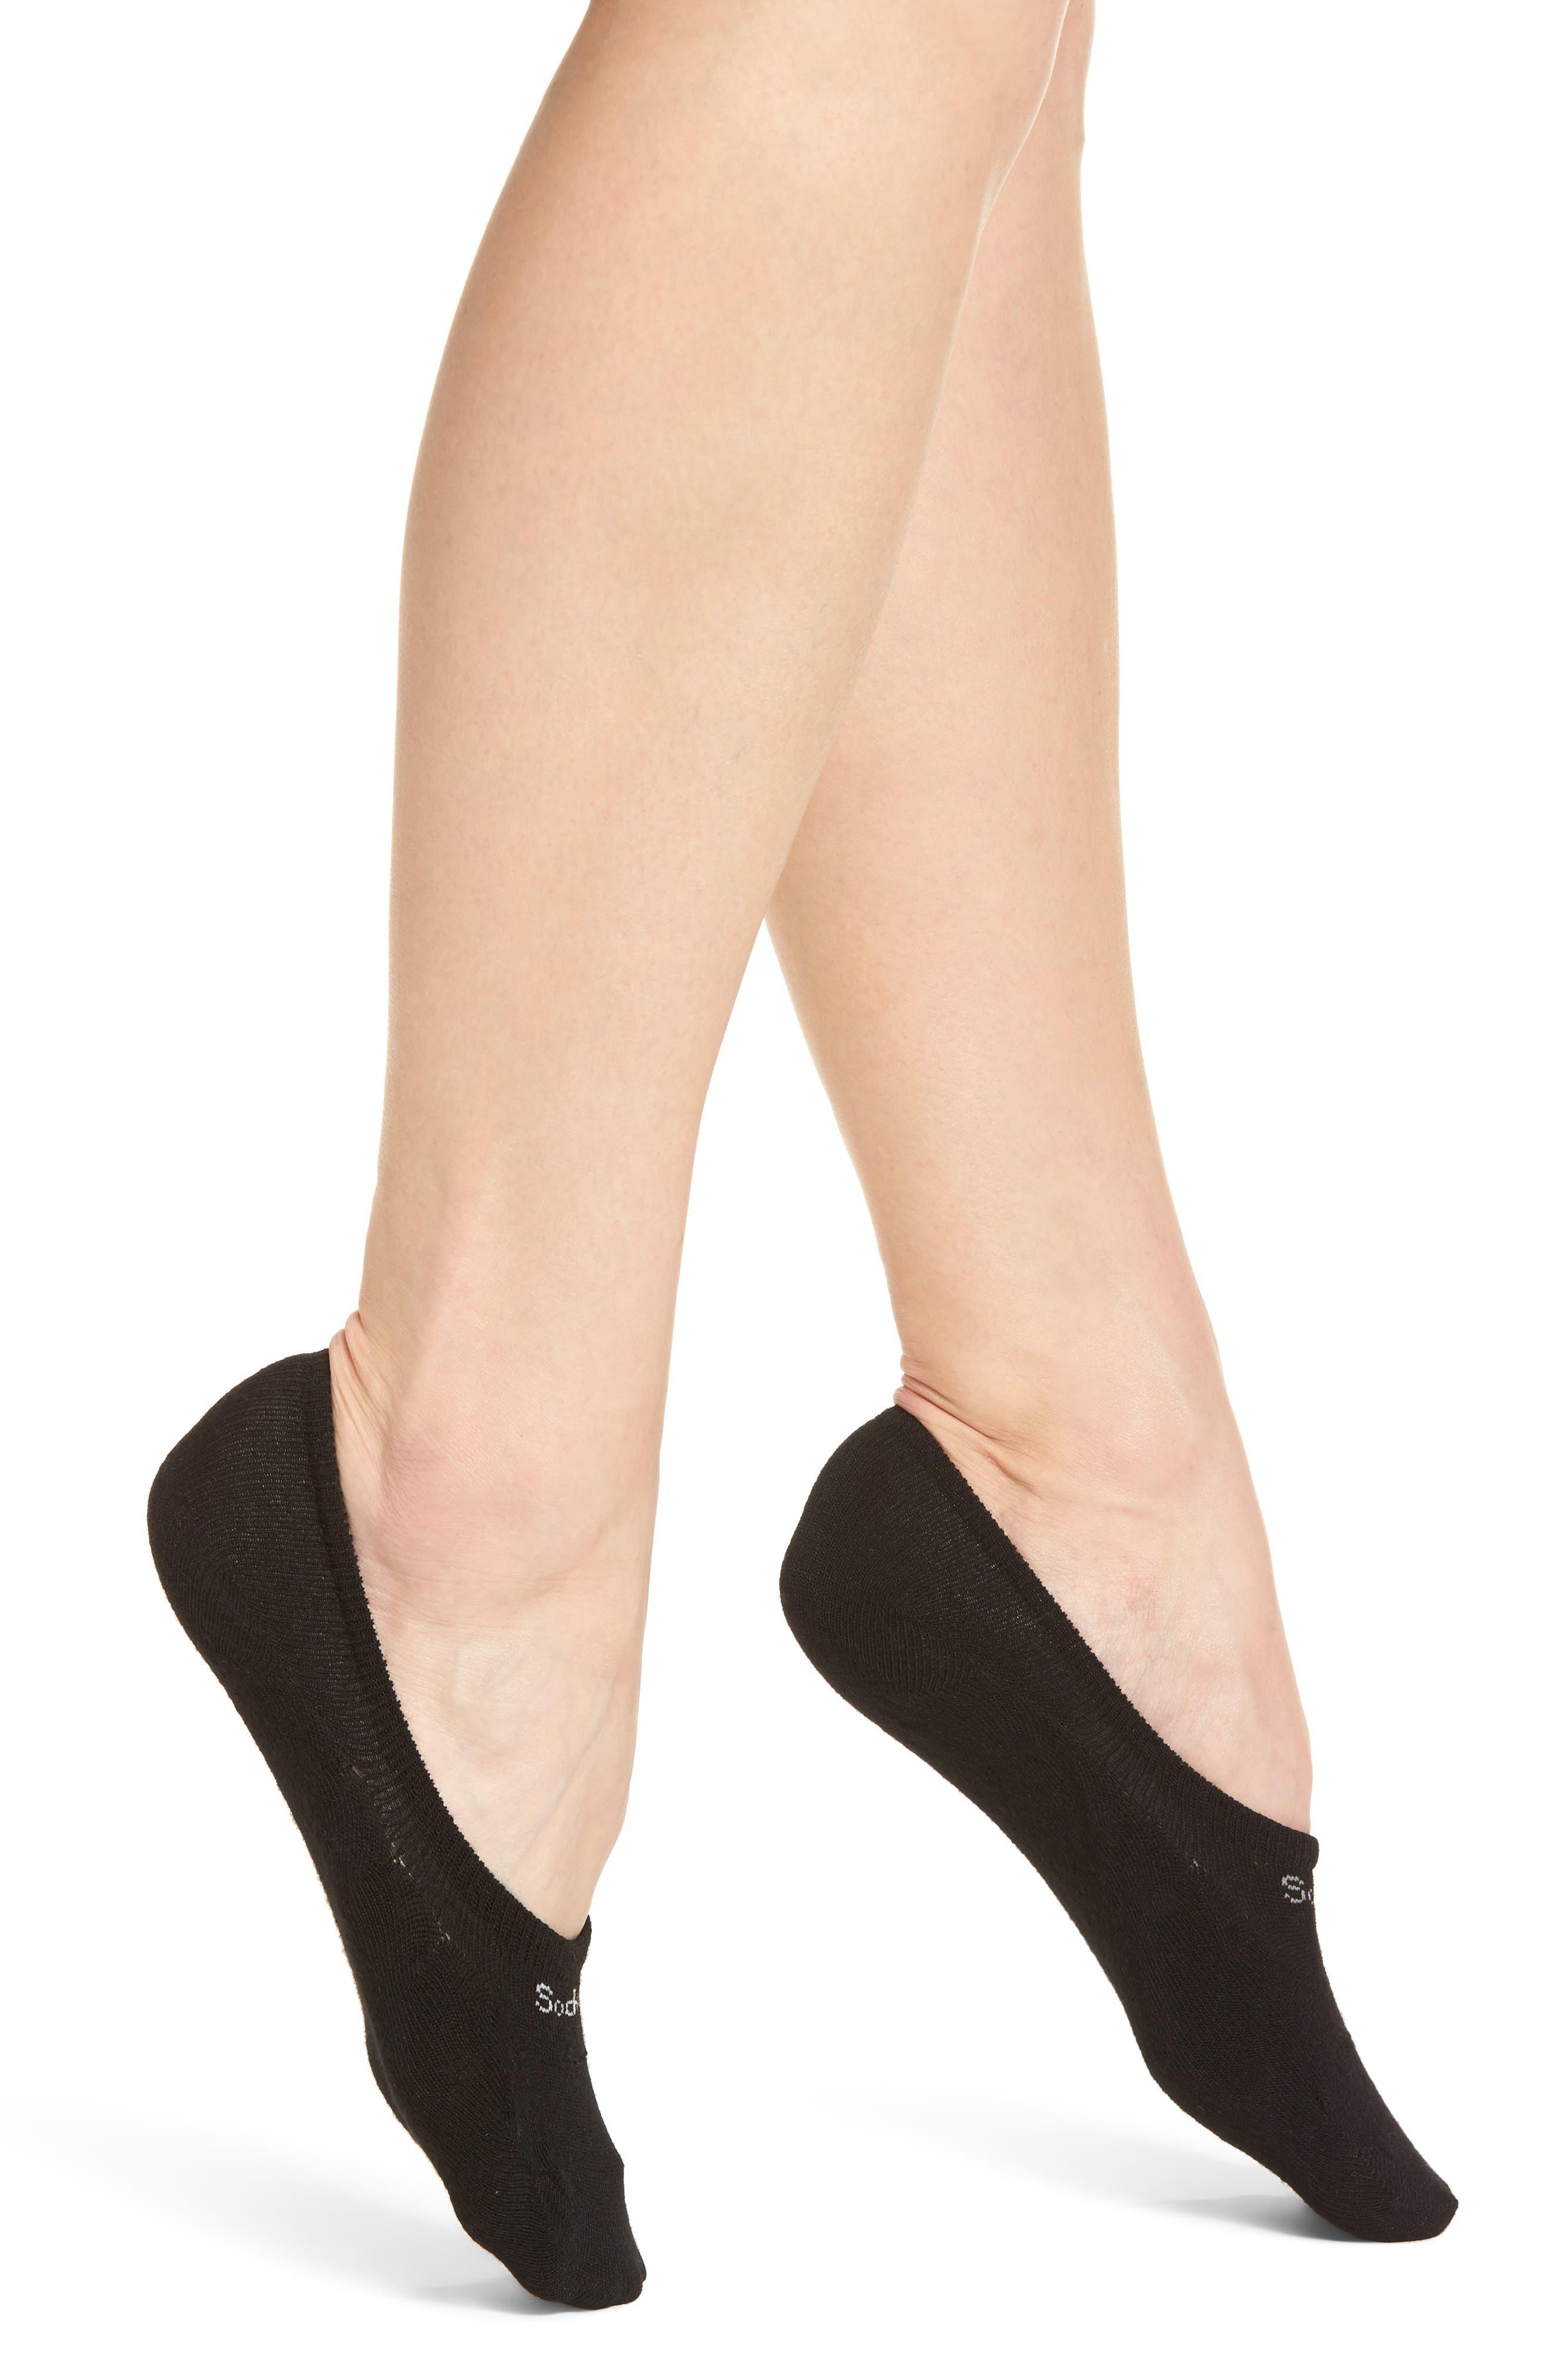 Undercover Liner Socks,                             Main thumbnail 1, color,                             Black